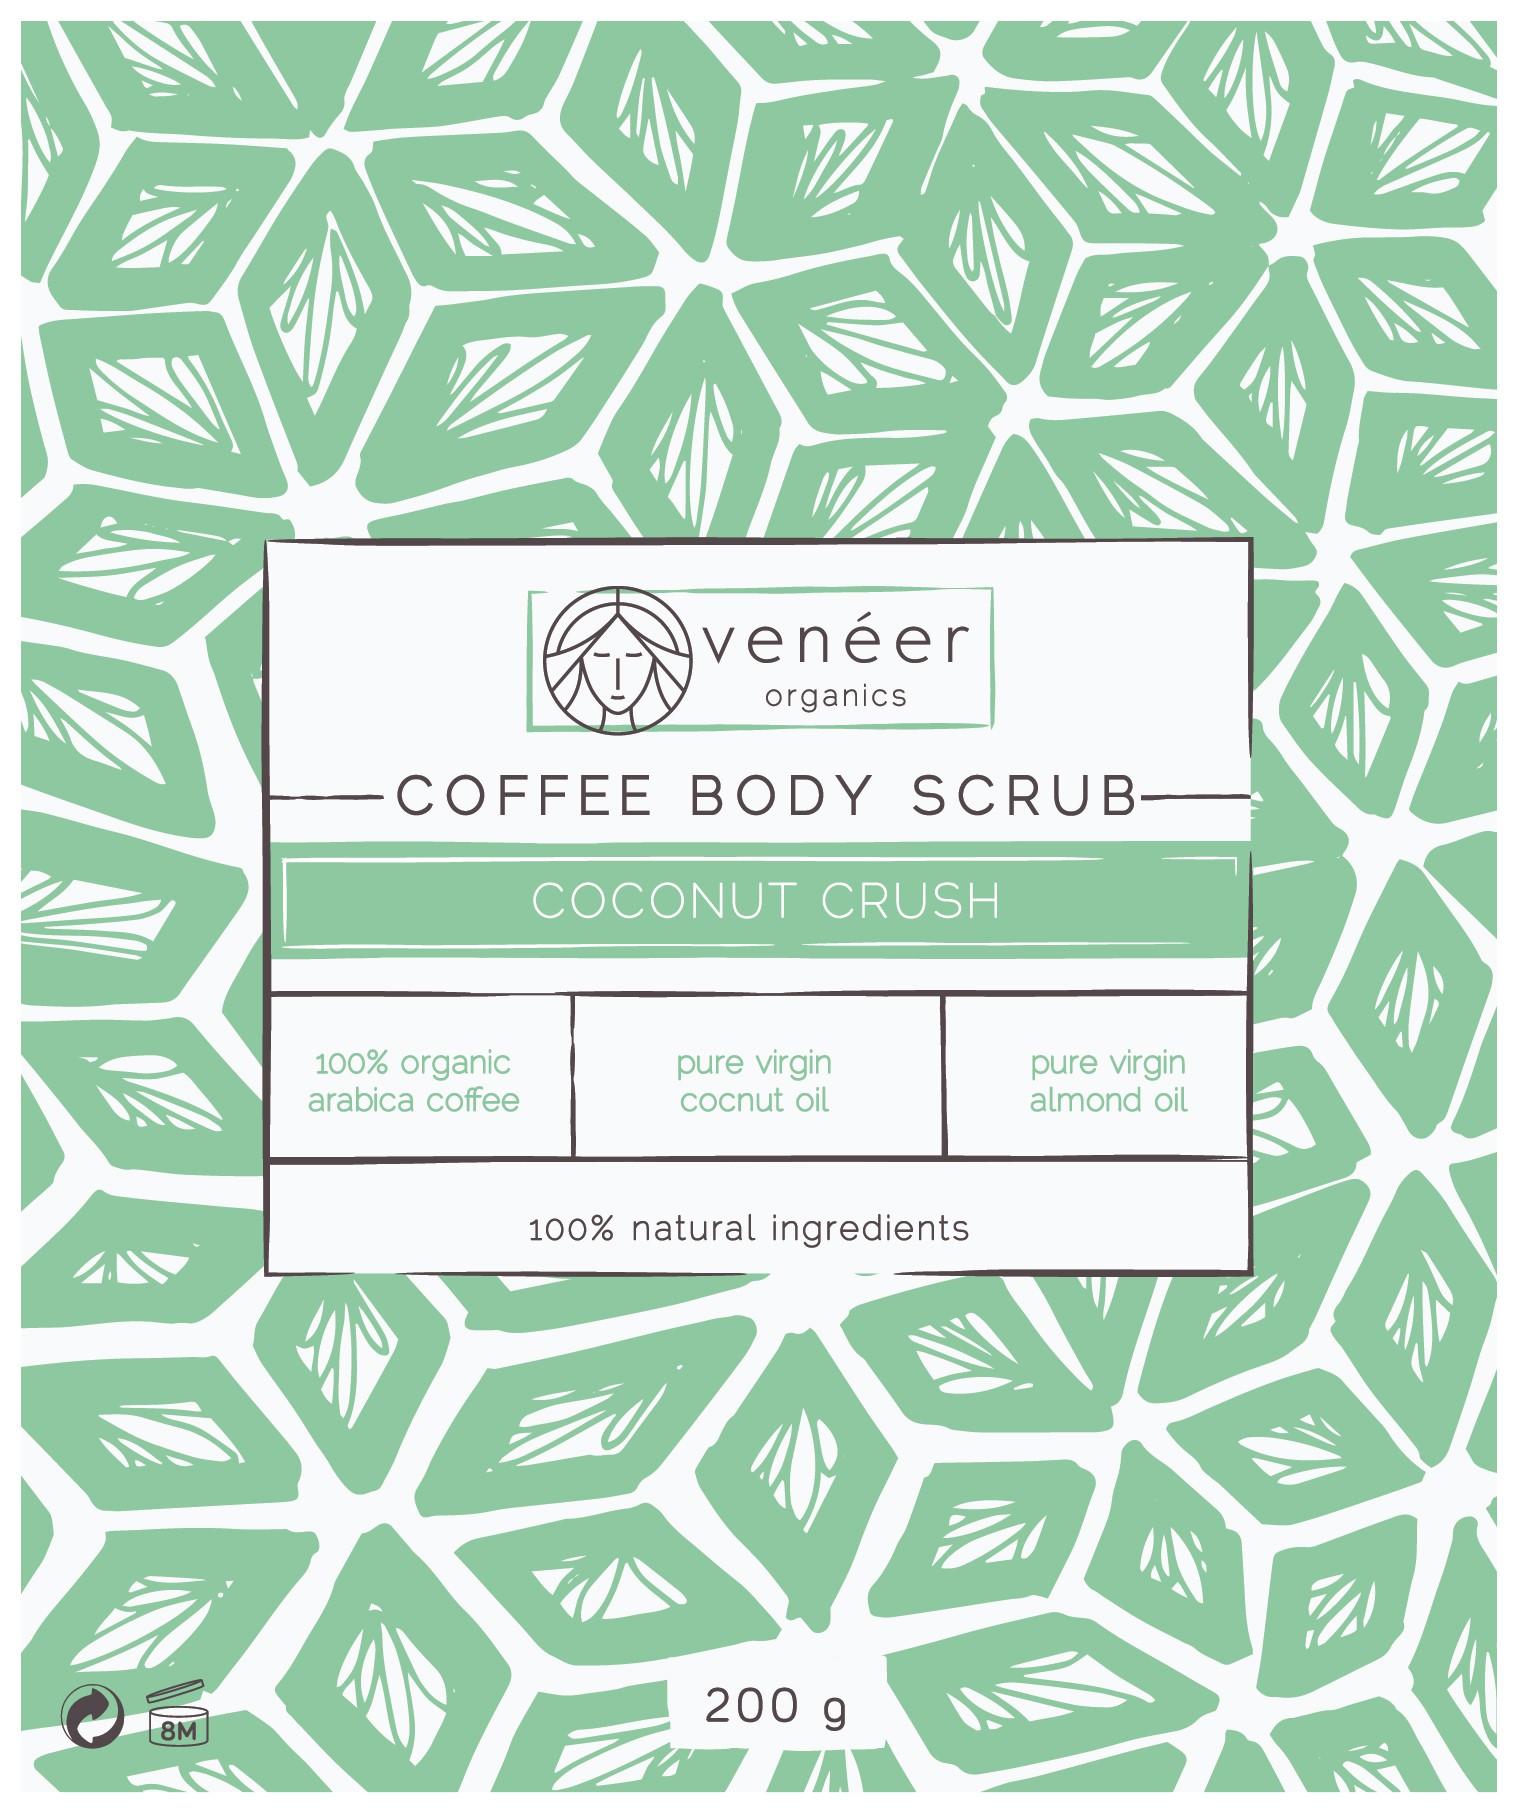 LABEL FOR COFFEE SCRUB